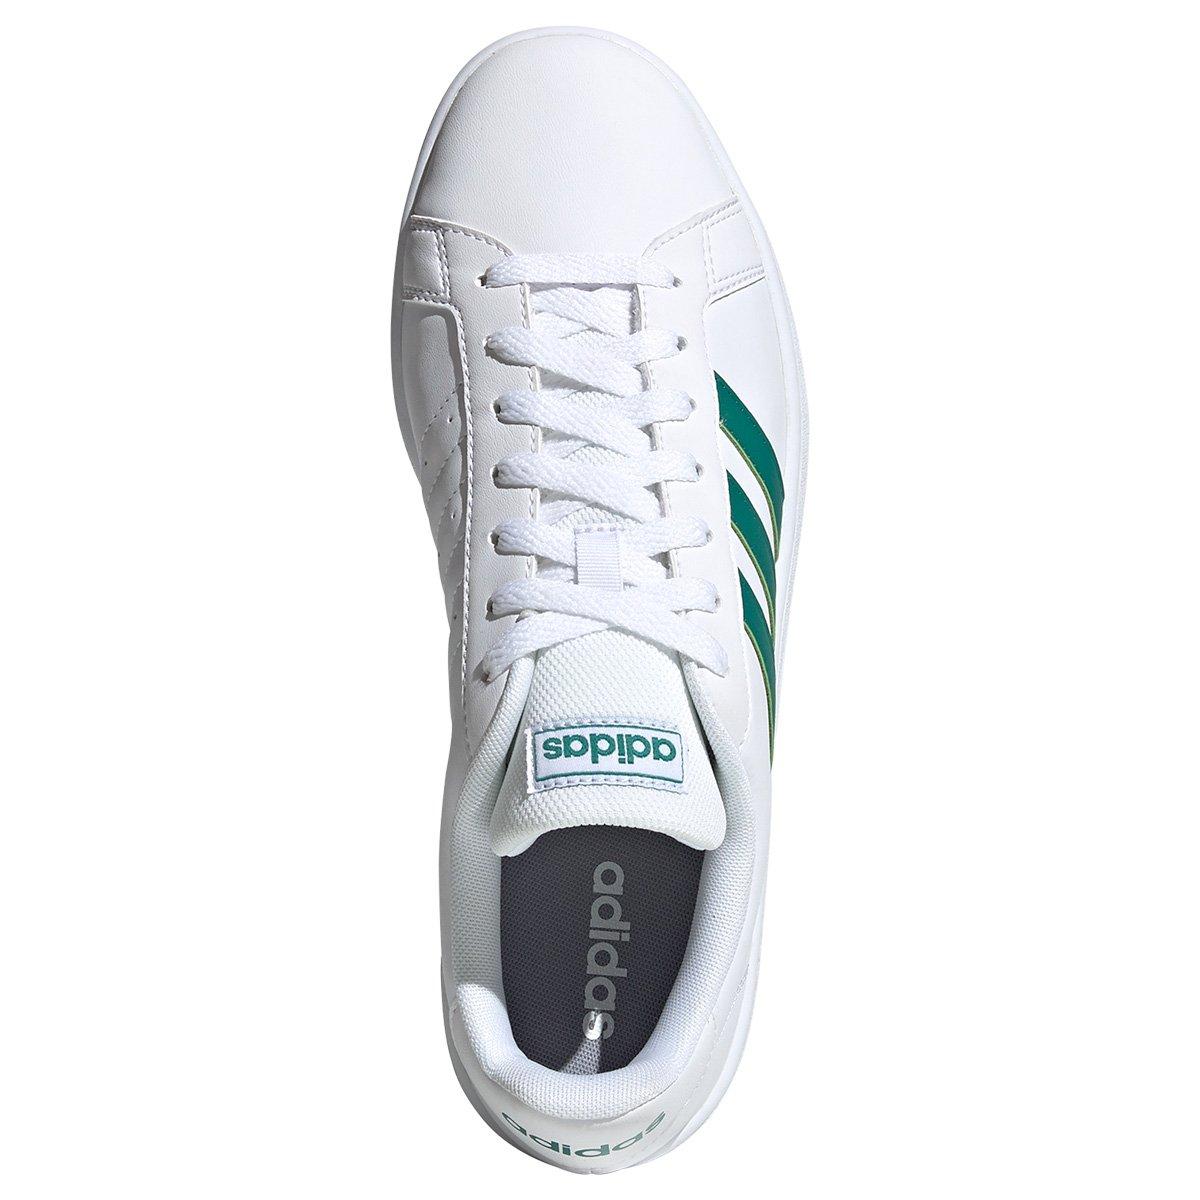 Tênis Adidas Branco Grand Court Base Masculino